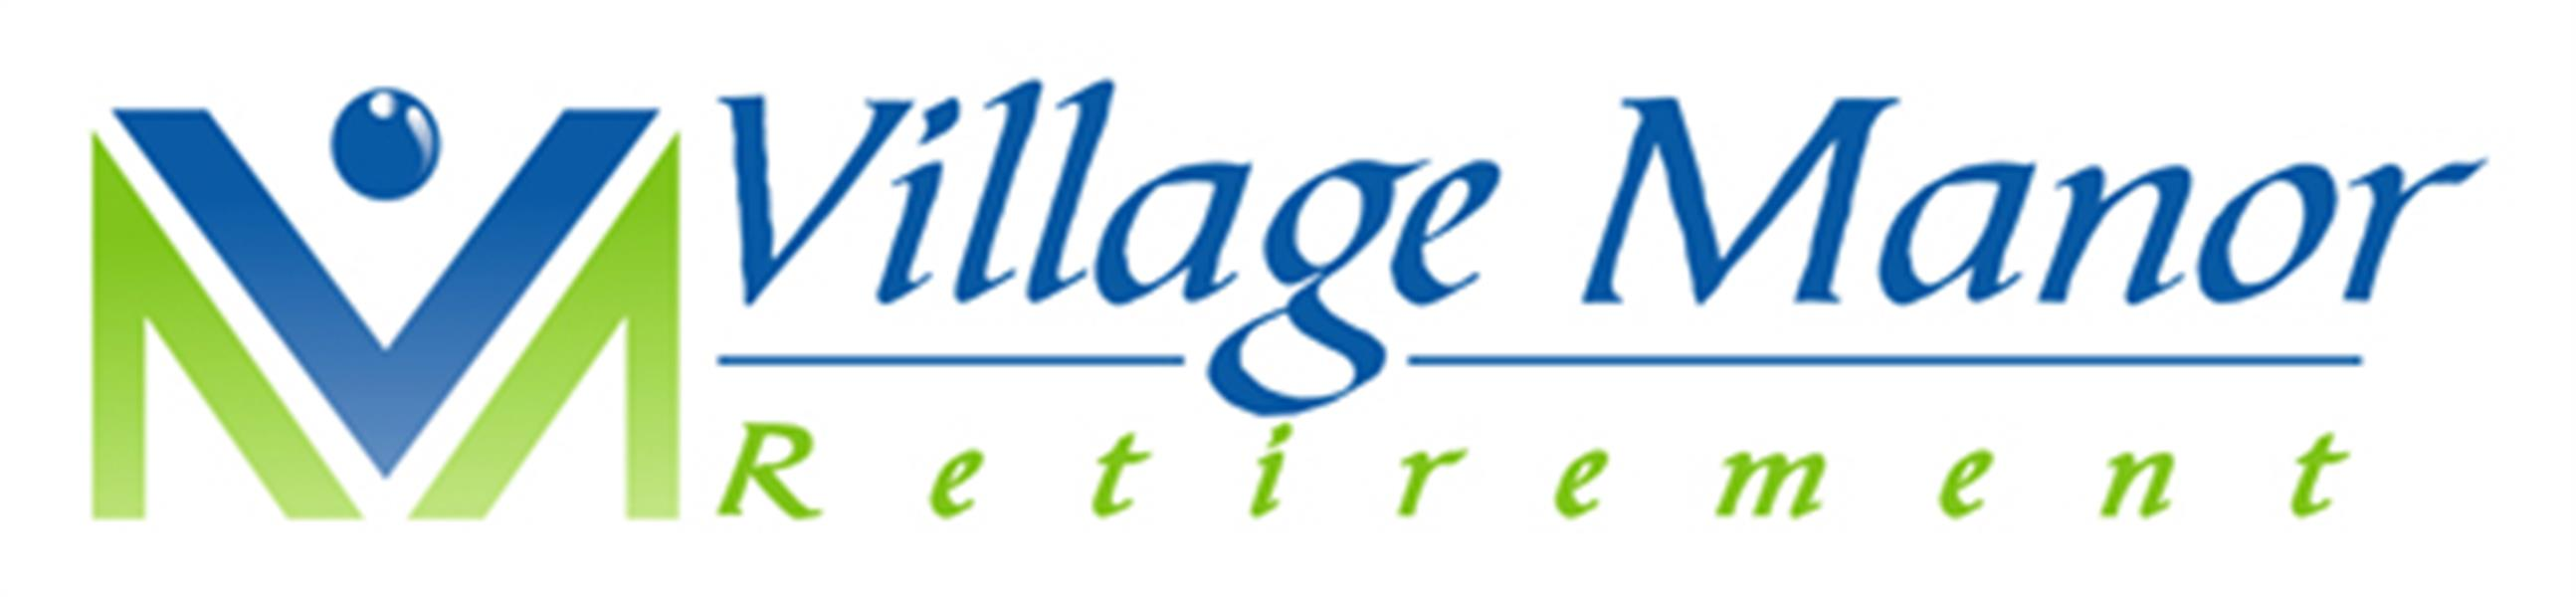 Village Manor Retirement of Hartland